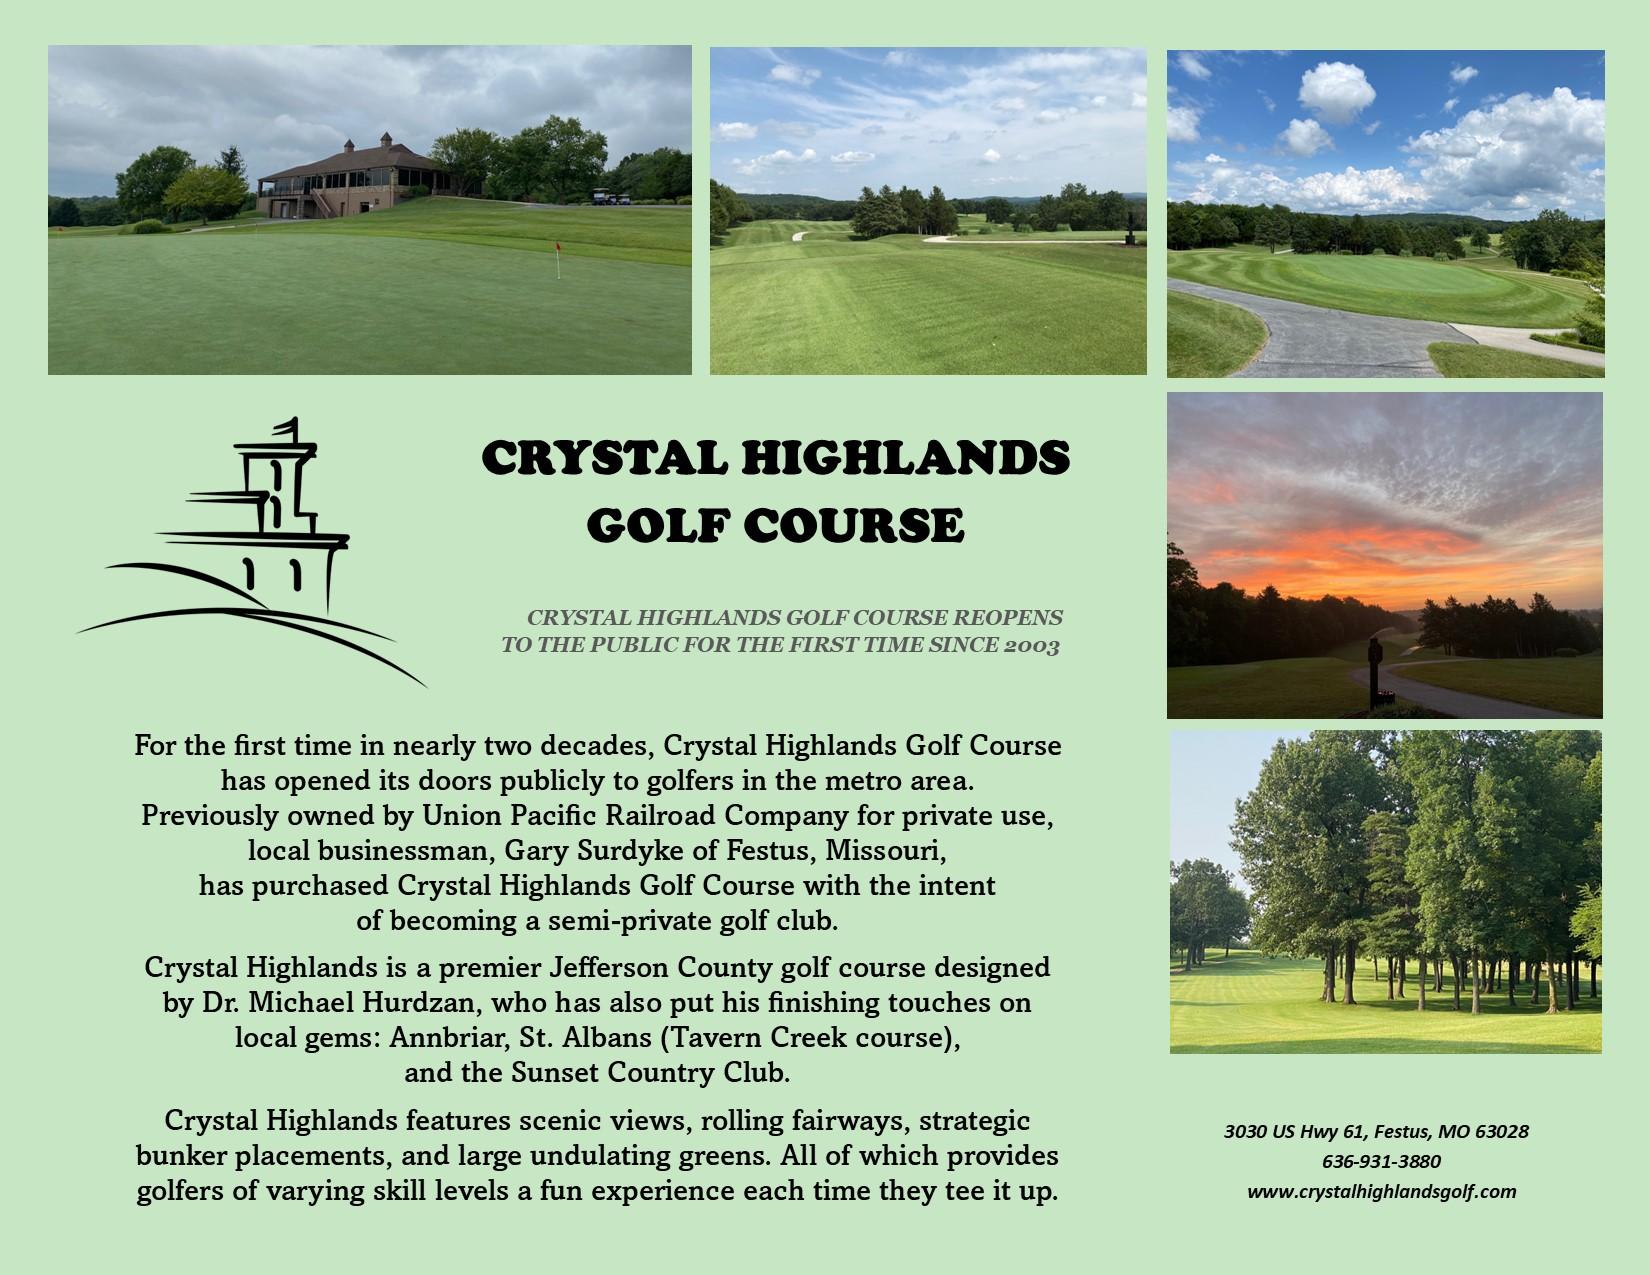 Crystal Highlands Golf Course